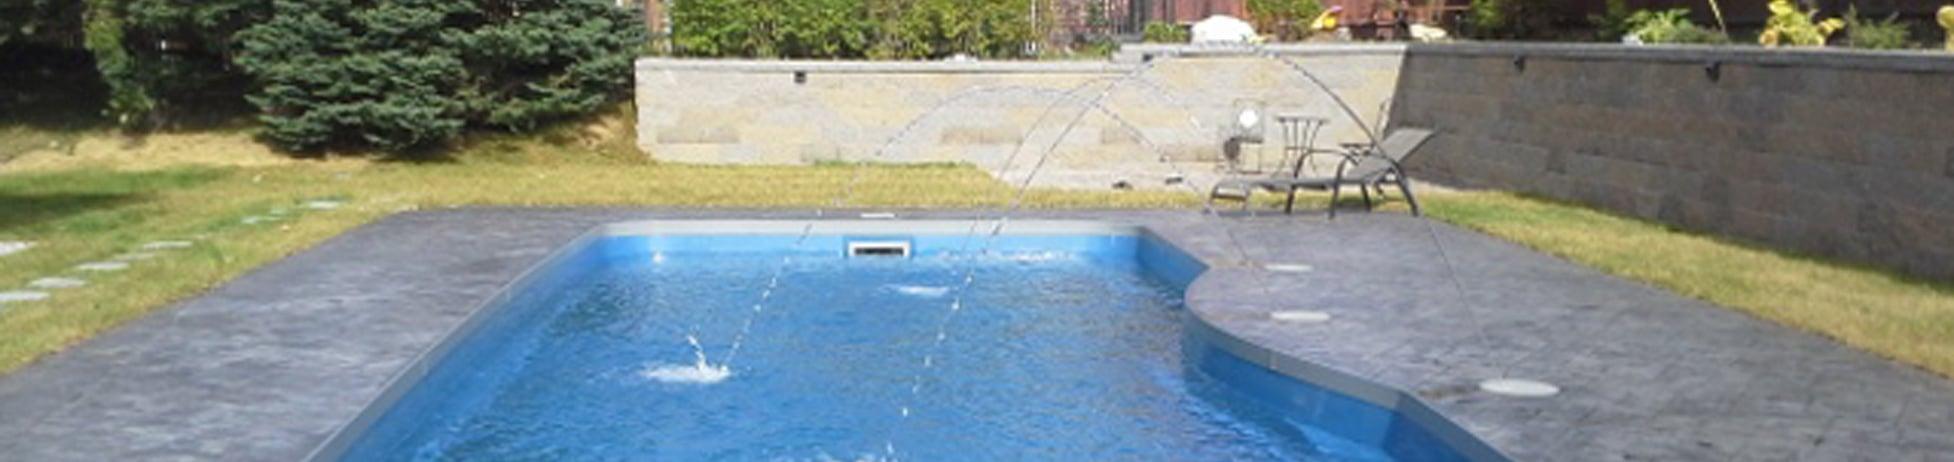 pool-header-3